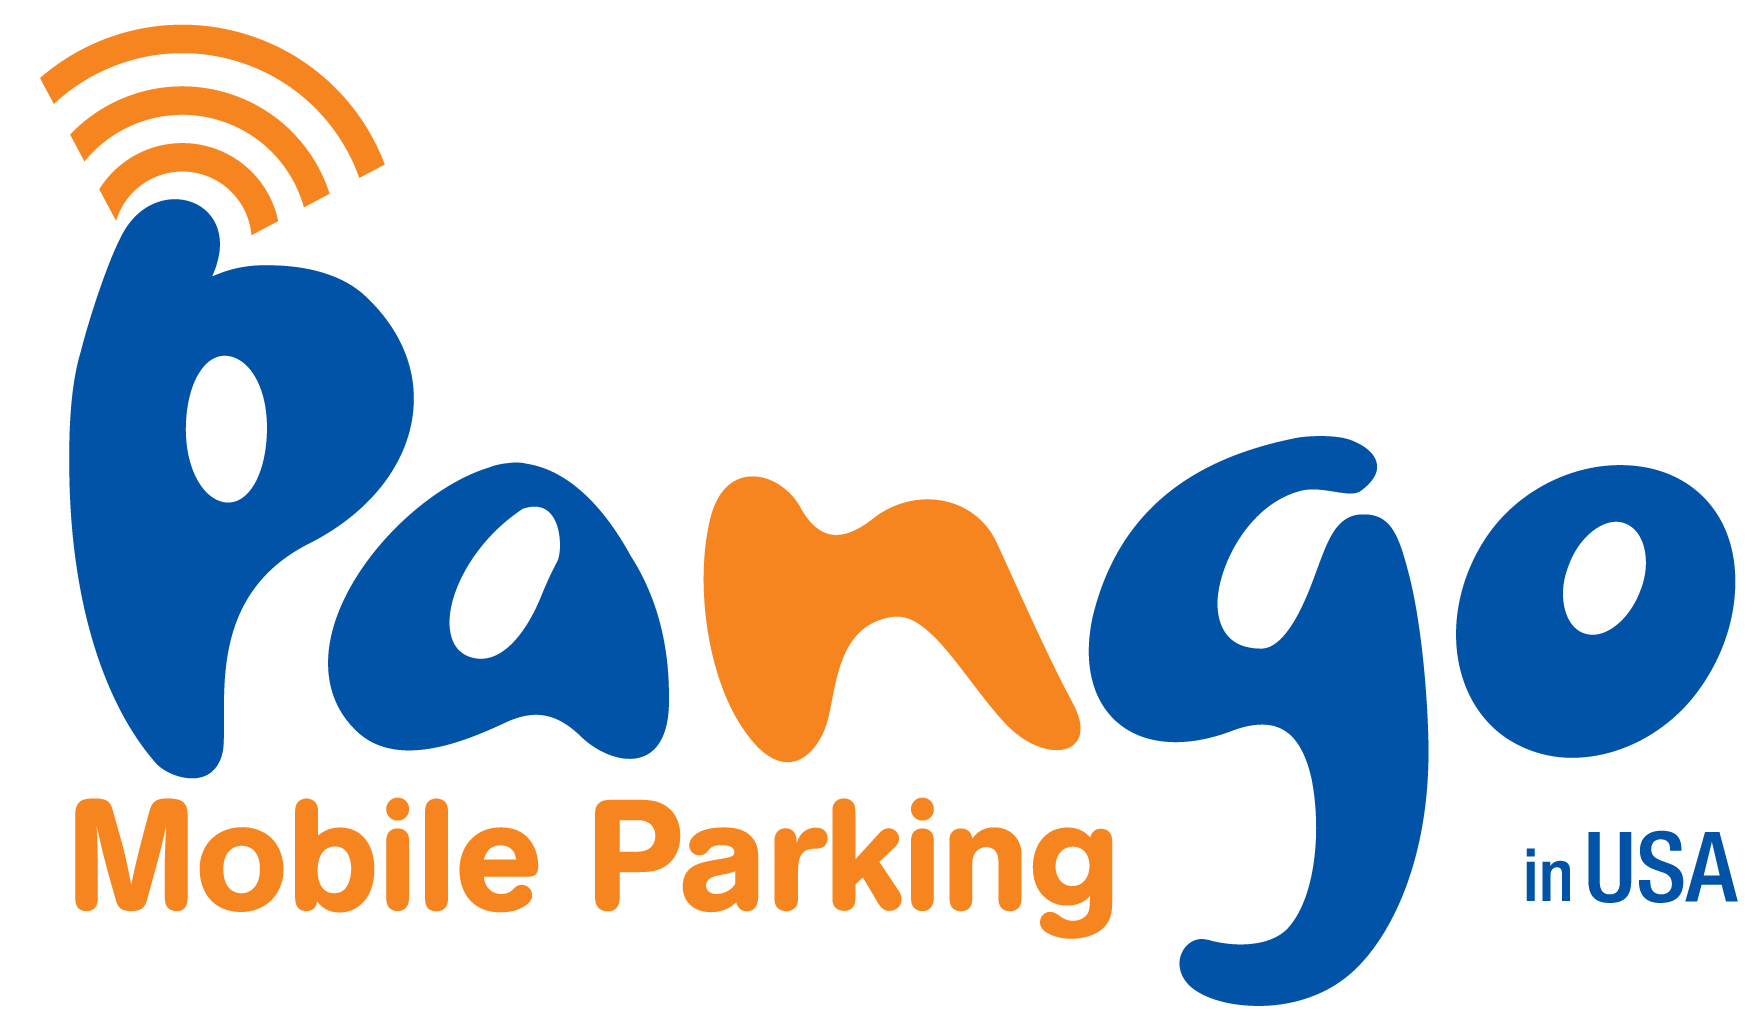 Pango Mobile Parking